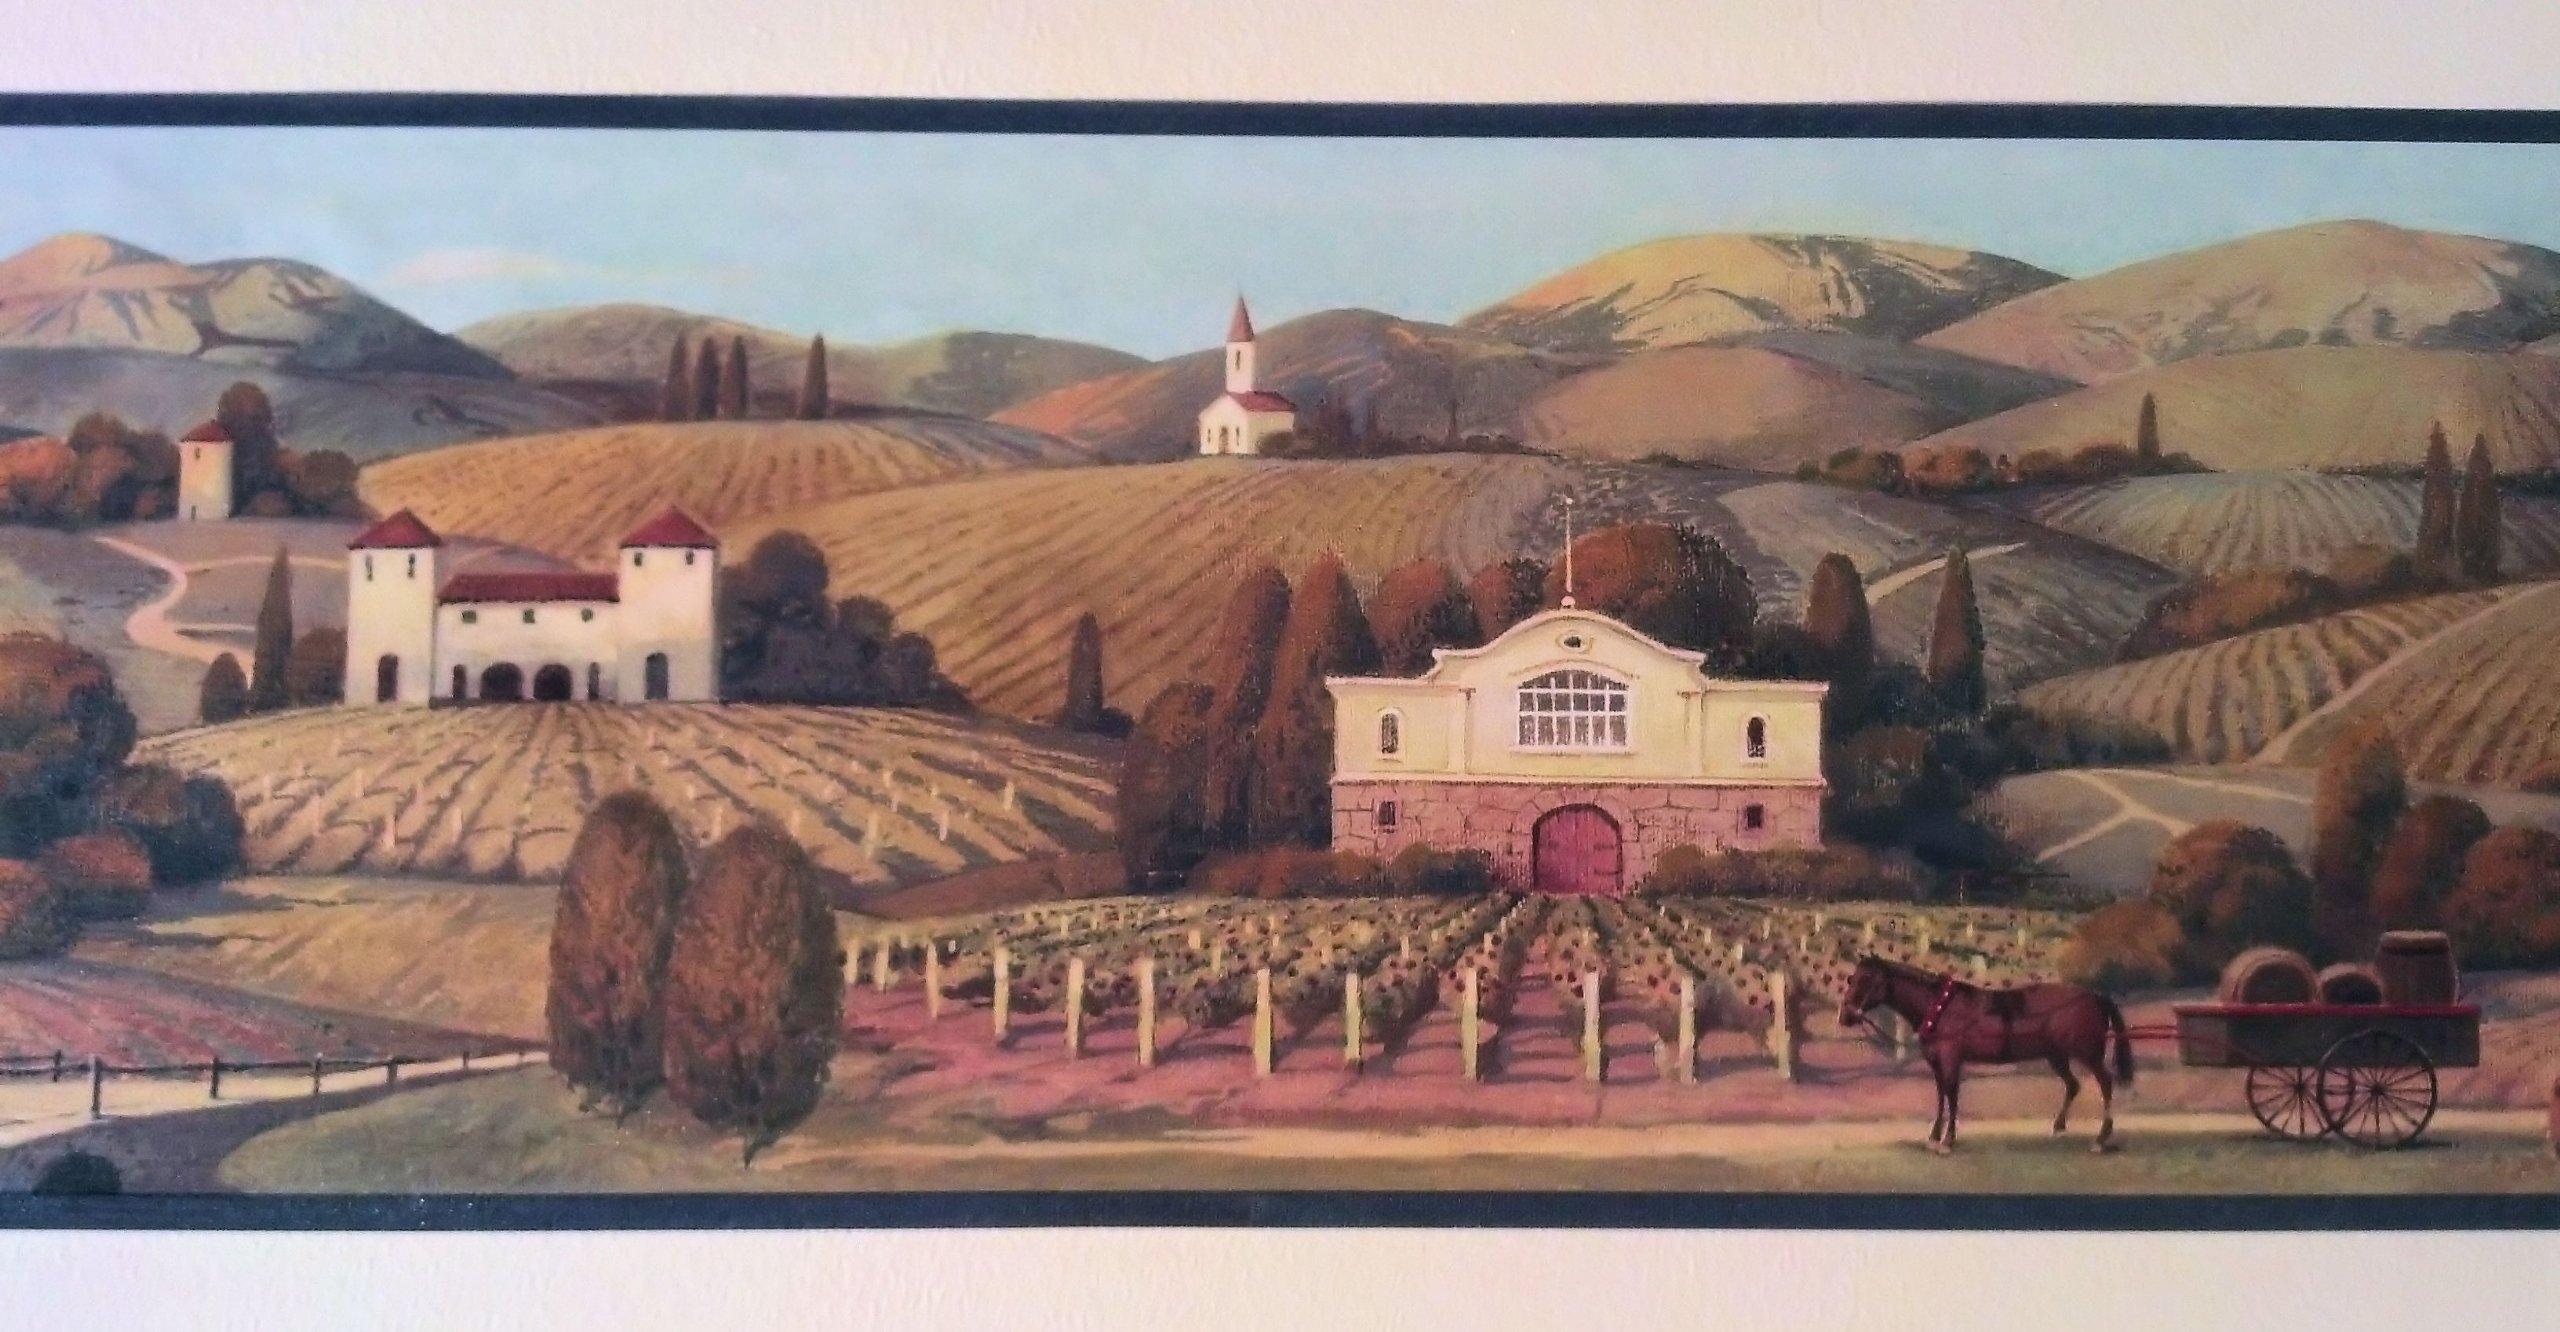 Wine, Vineyard Winery Grapes Wallpaper Border